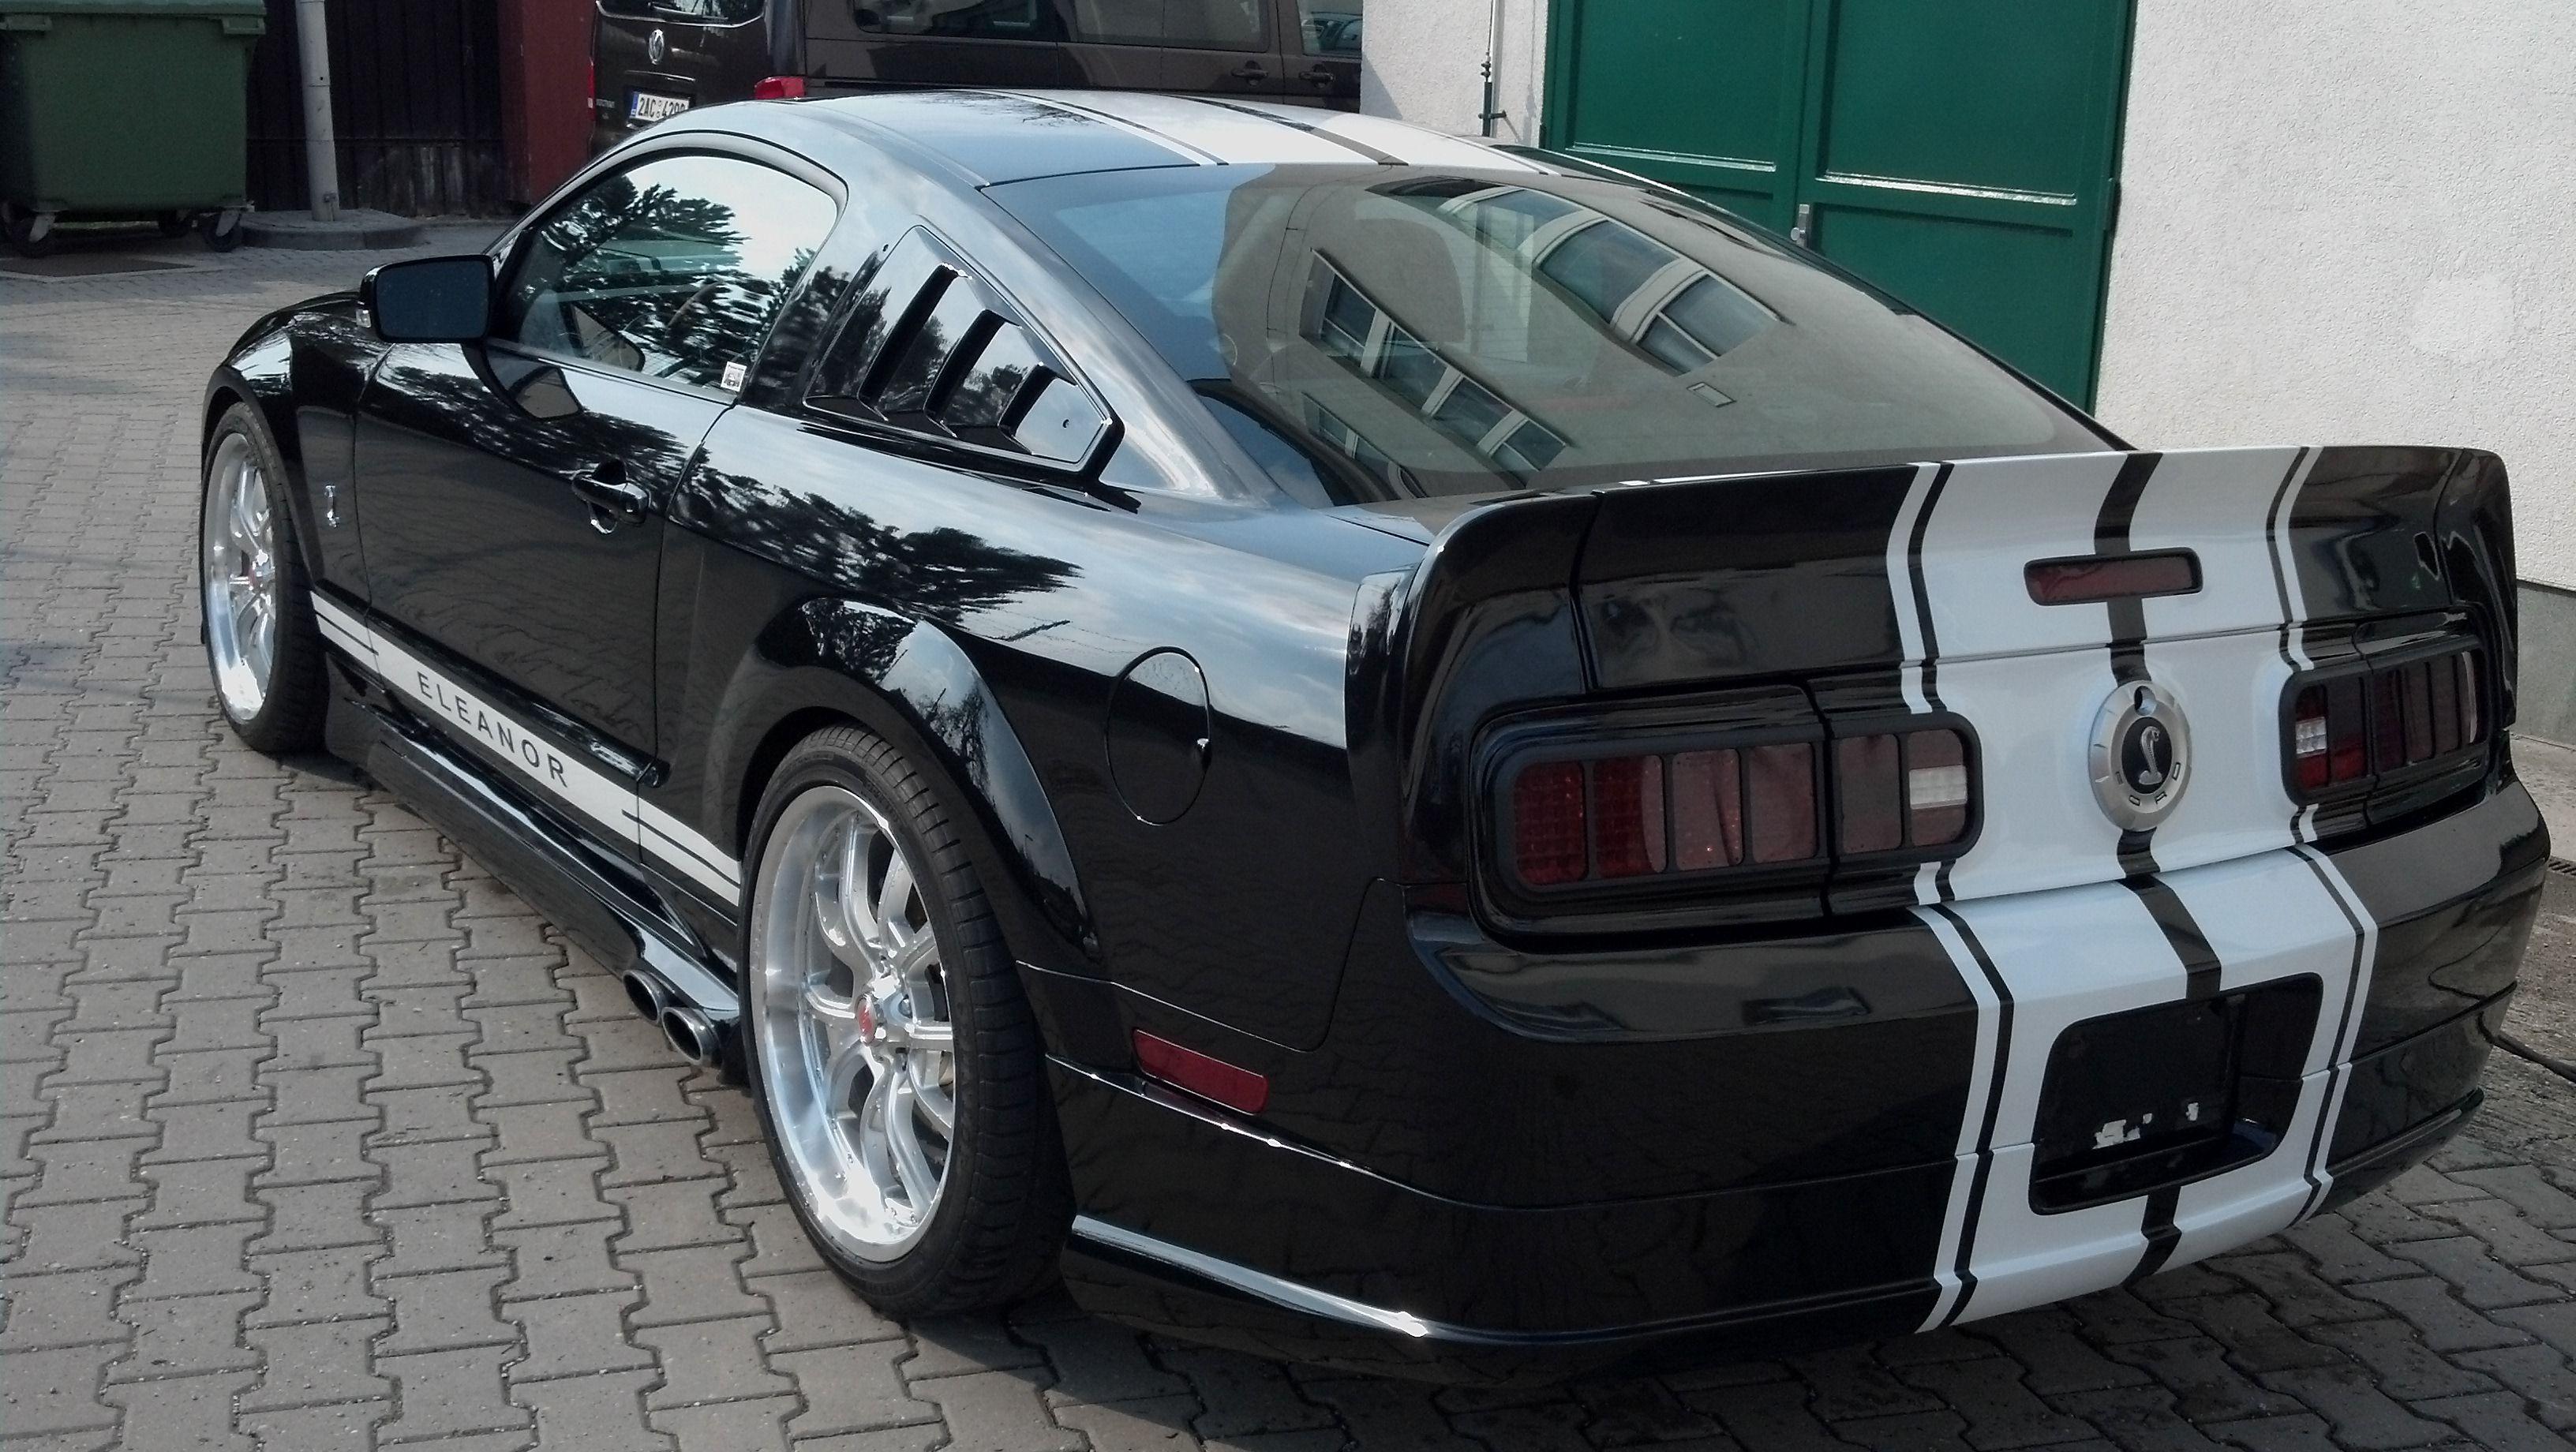 Mustang tail light